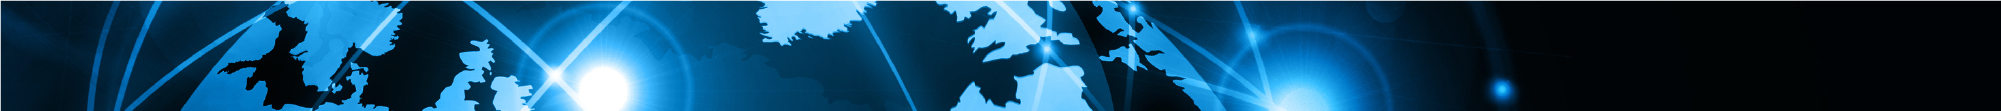 מדריך מסחר אלקטרוני  - E-commerce